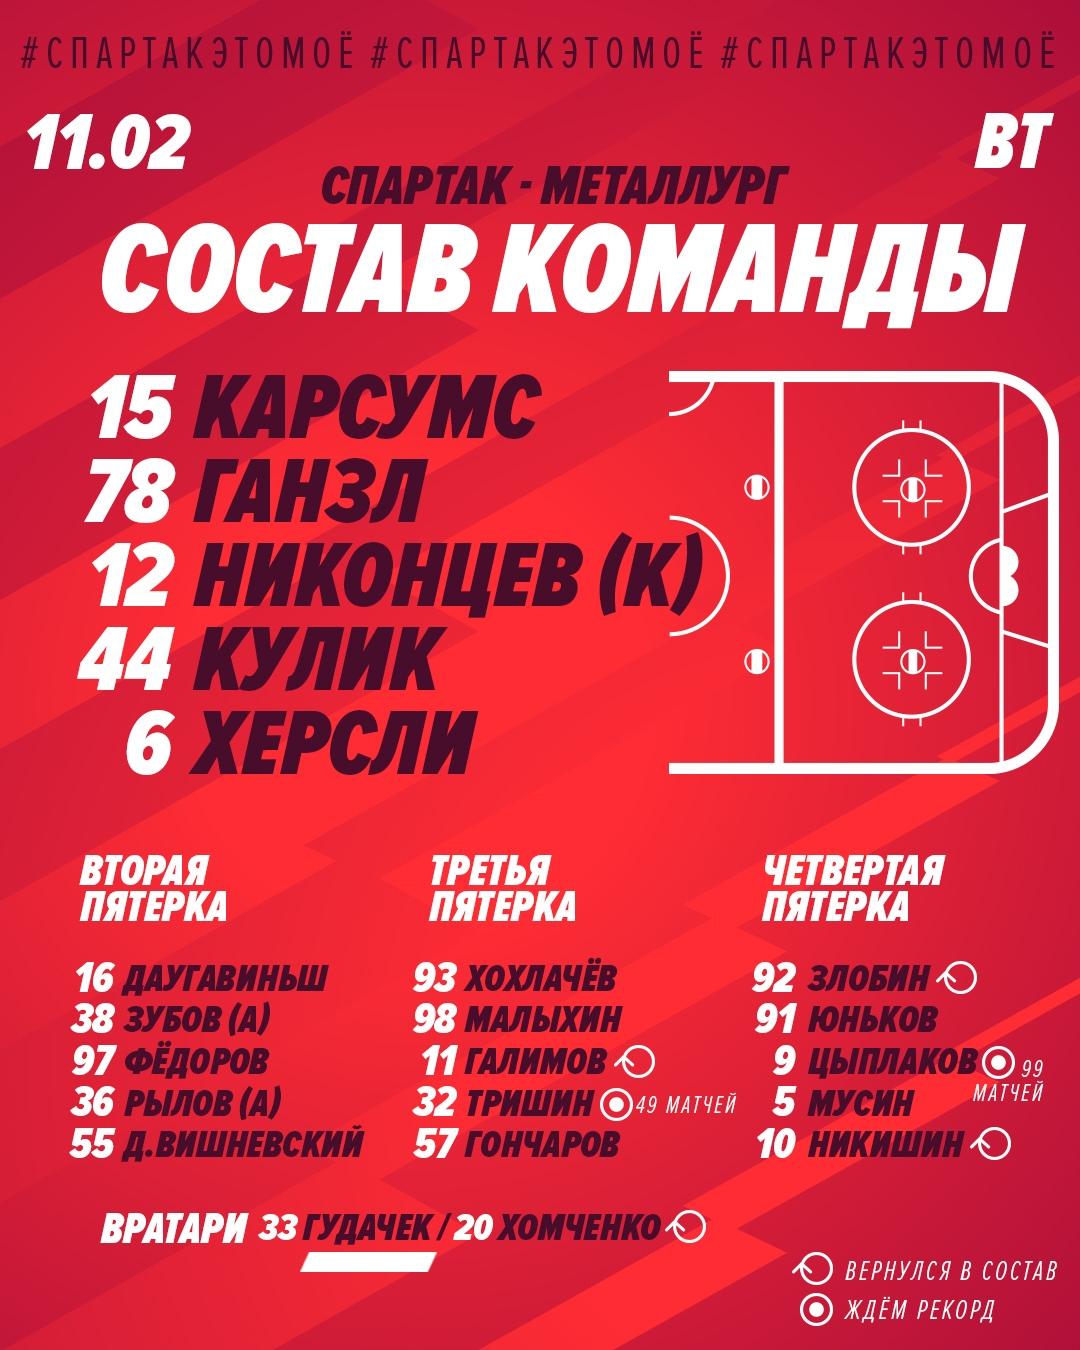 Состав «Спартака» на матч с «Металлургом»